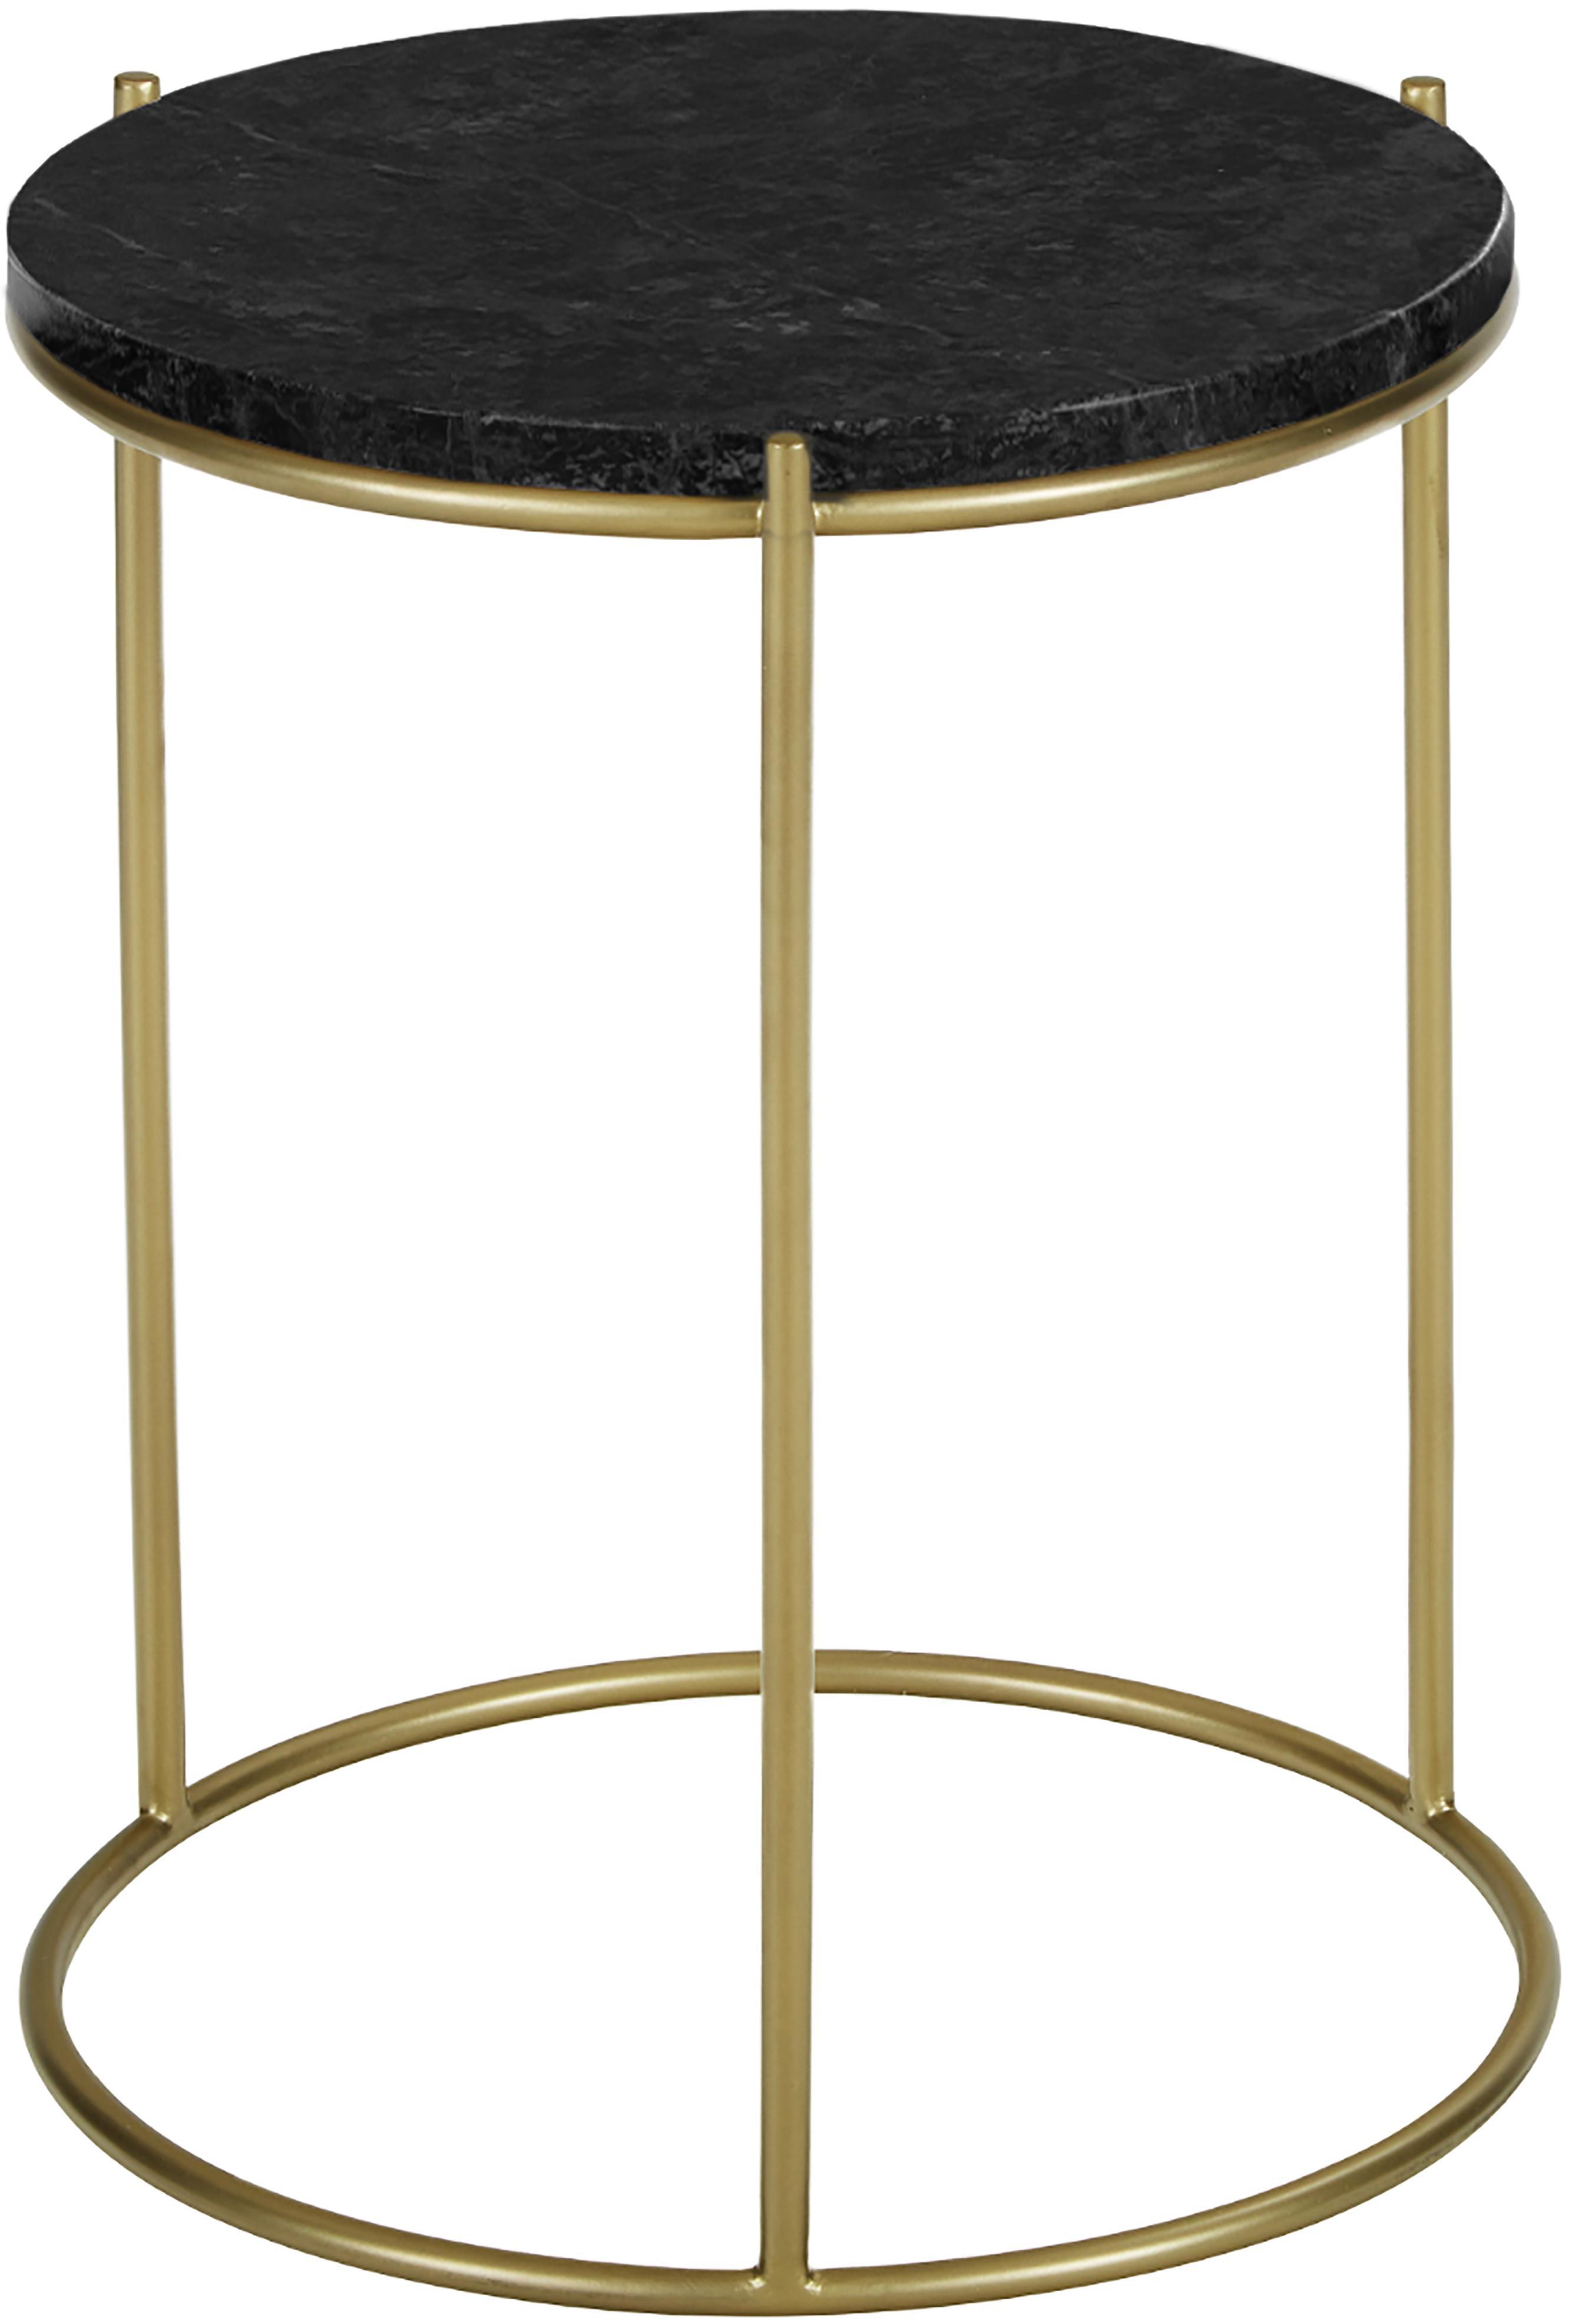 Ronde marmeren bijzettafel Ella, Tafelblad: marmer, Frame: gepoedercoat metaal, Tafelblad: zwart marmer. Frame: mat goudkleurig, Ø 40 x H 50 cm